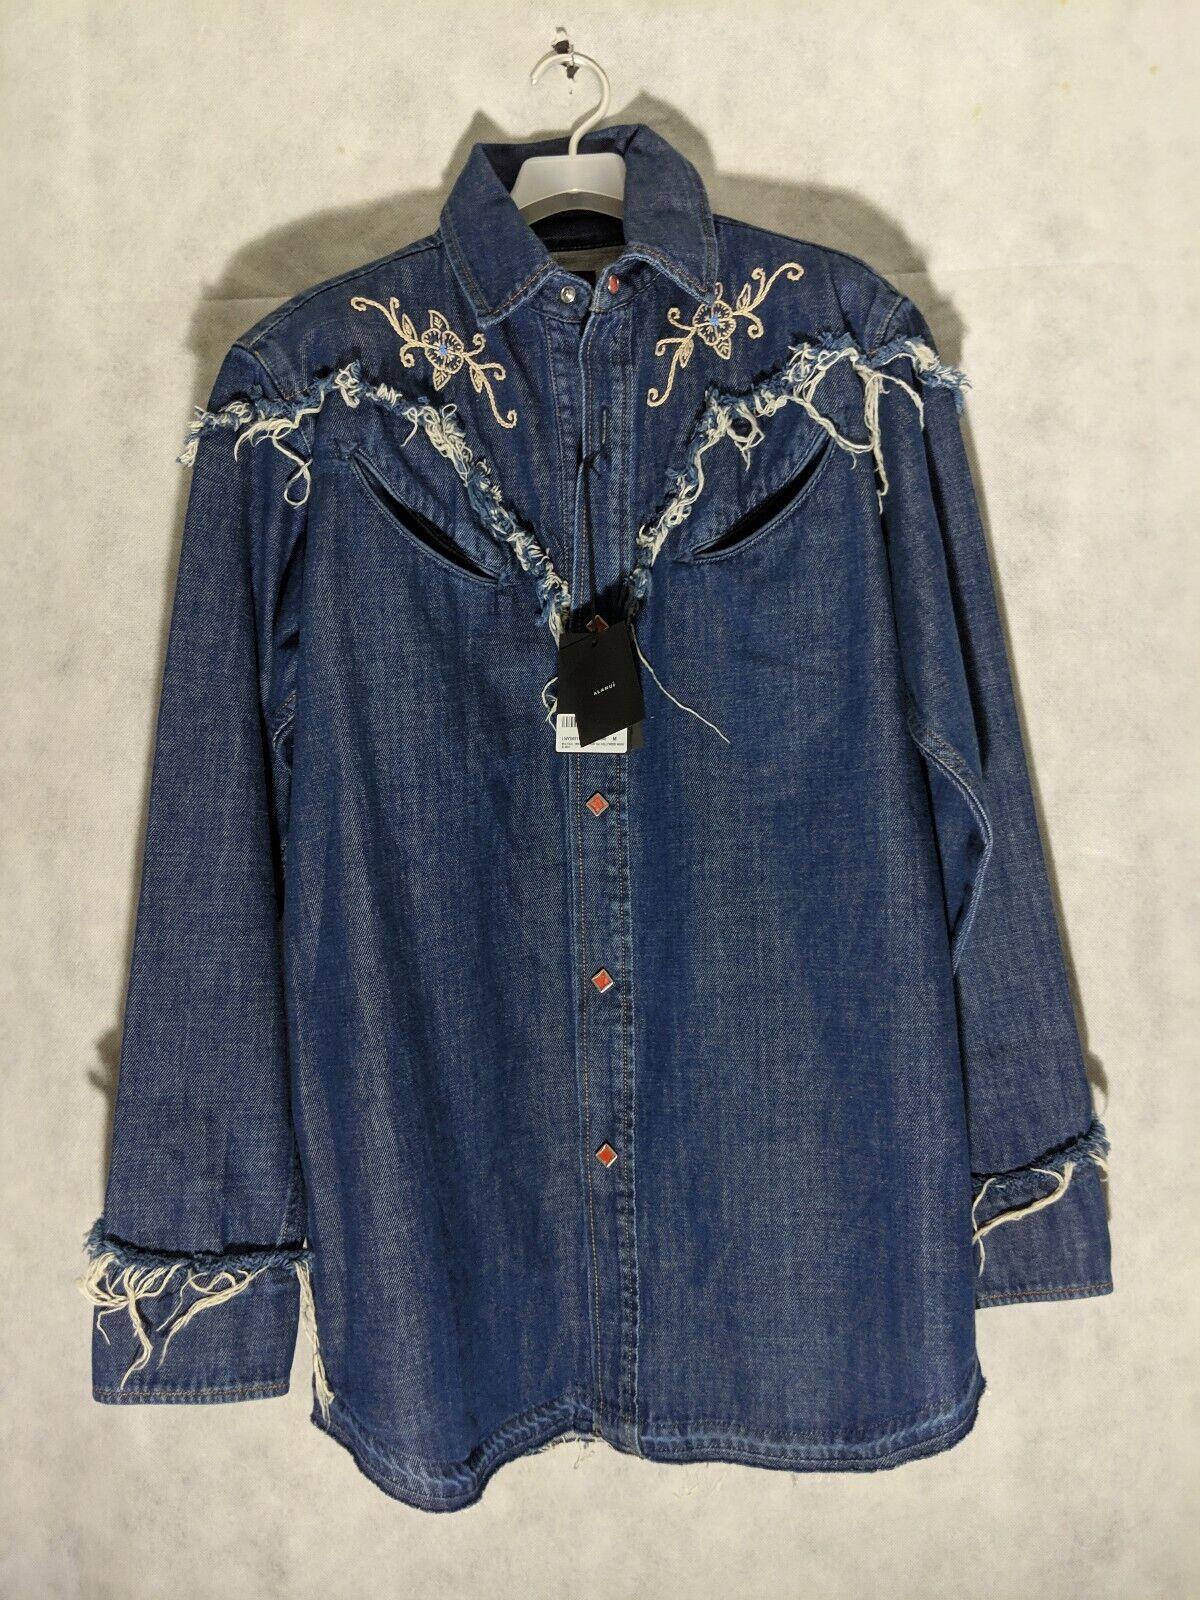 Alanui Western Denim Embroidered Snap Button Shirt NWT Medium